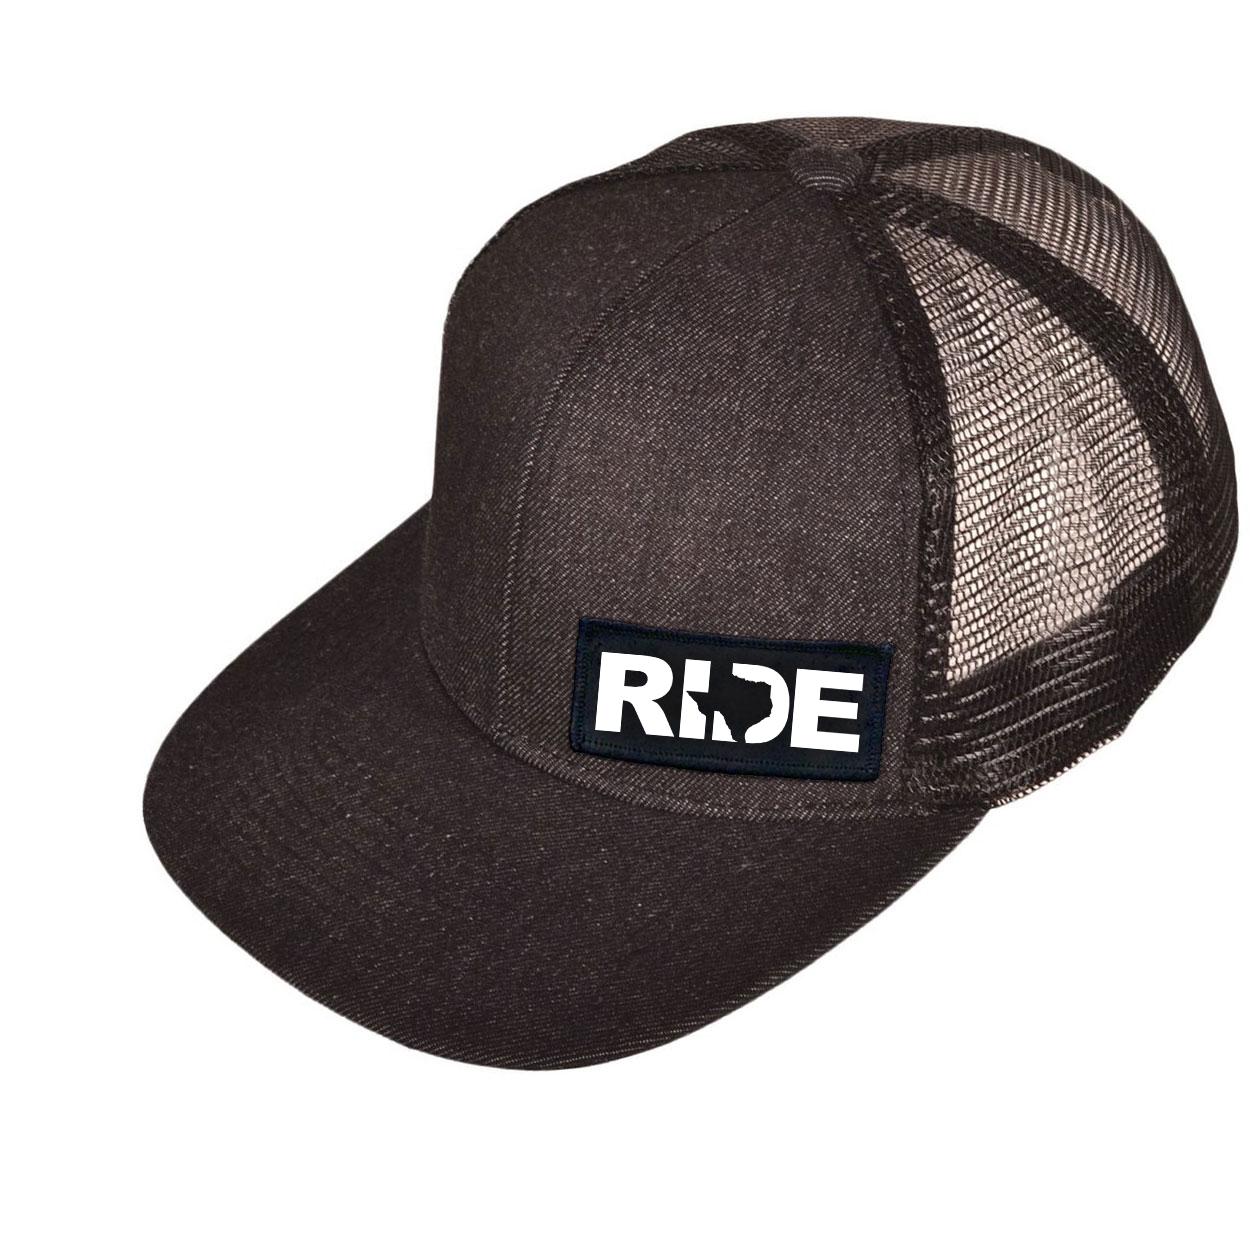 Ride Texas Night Out Woven Patch Snapback Flat Brim Hat Black Denim (White Logo)